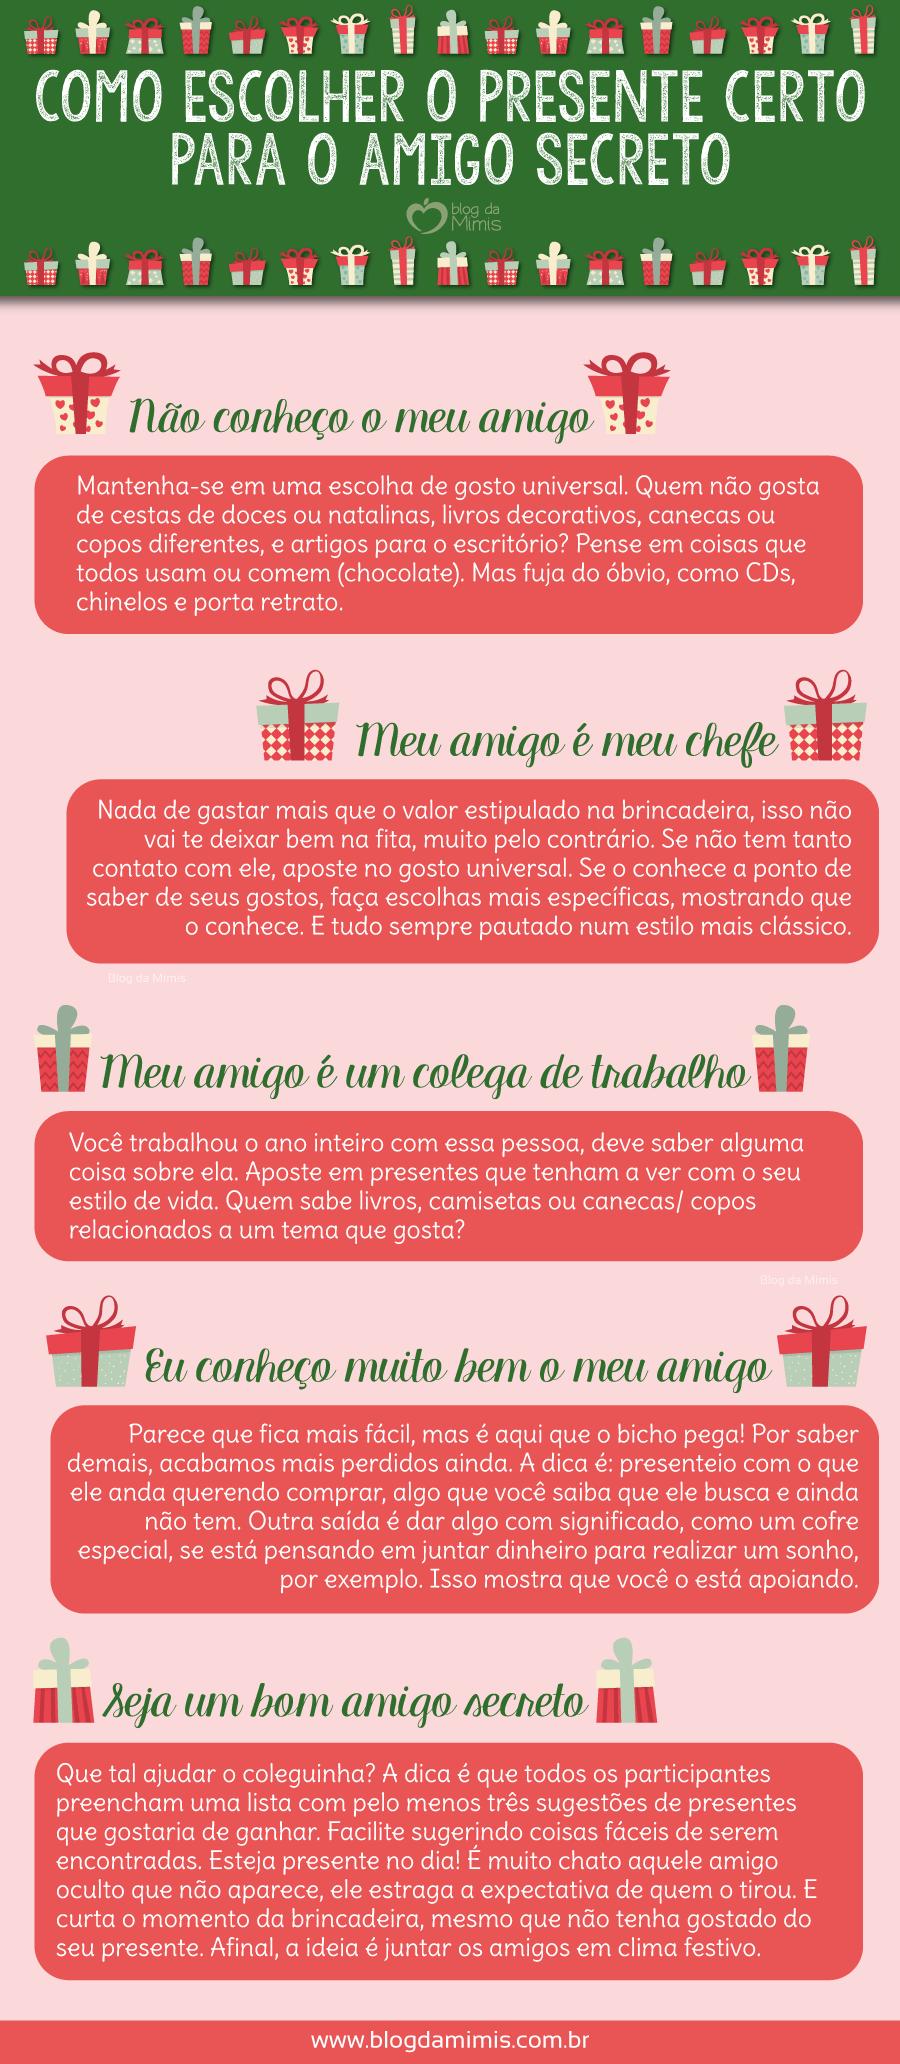 amigo-secreto-blog-da-mimis-michelle-franzoni-post